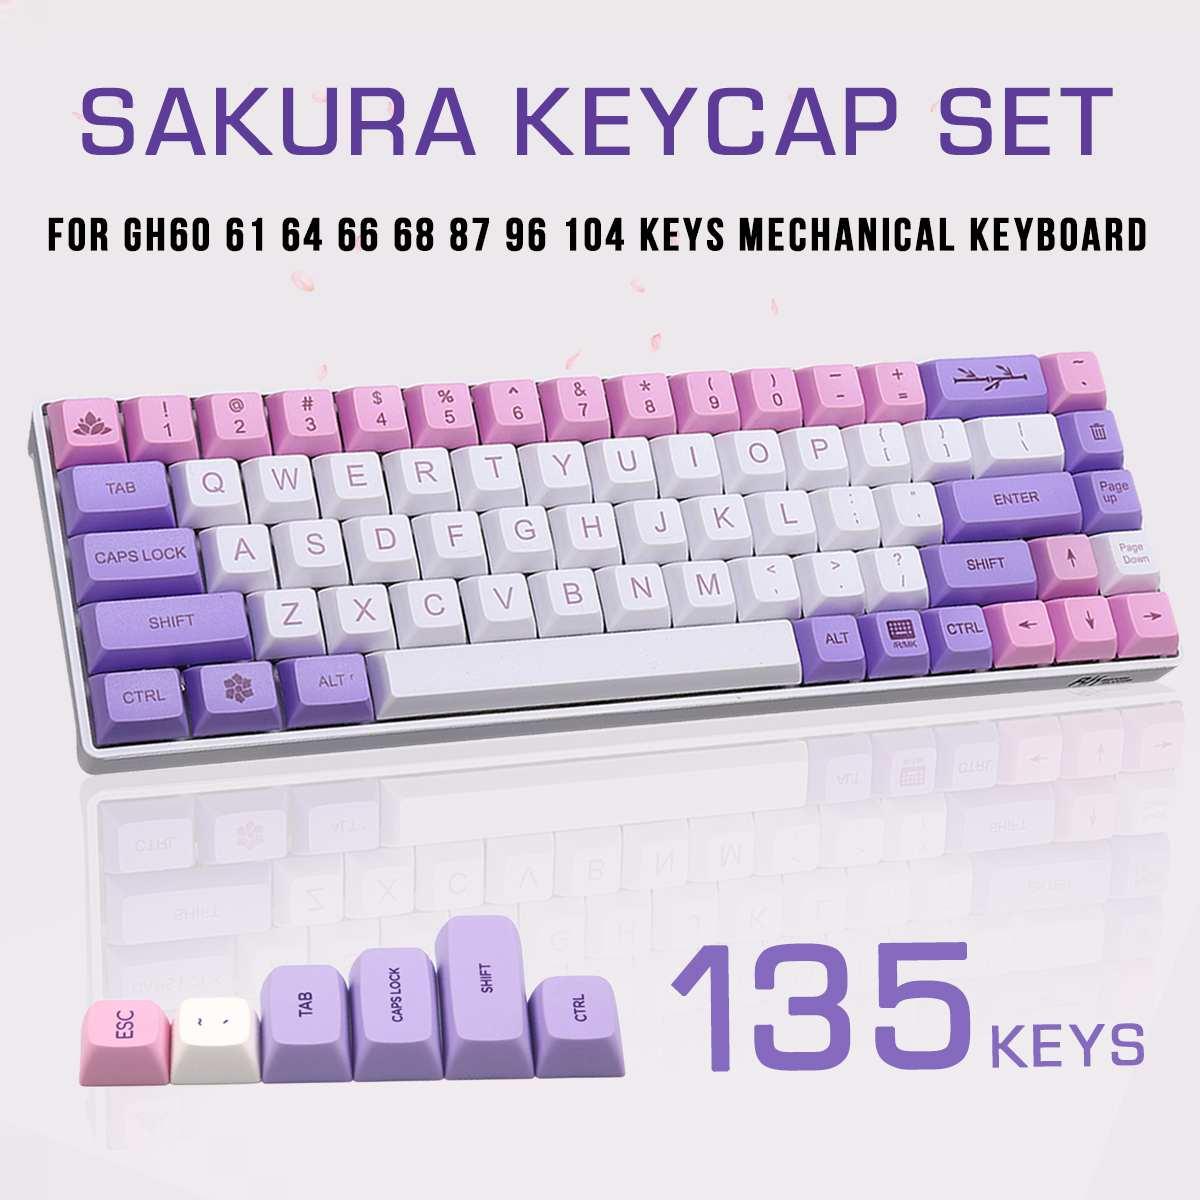 Novo 135 teclas sakura keycap xda perfil sublimação pbt keycaps para gh60 61 64 66 68 87 96 104 teclas teclado mecânico